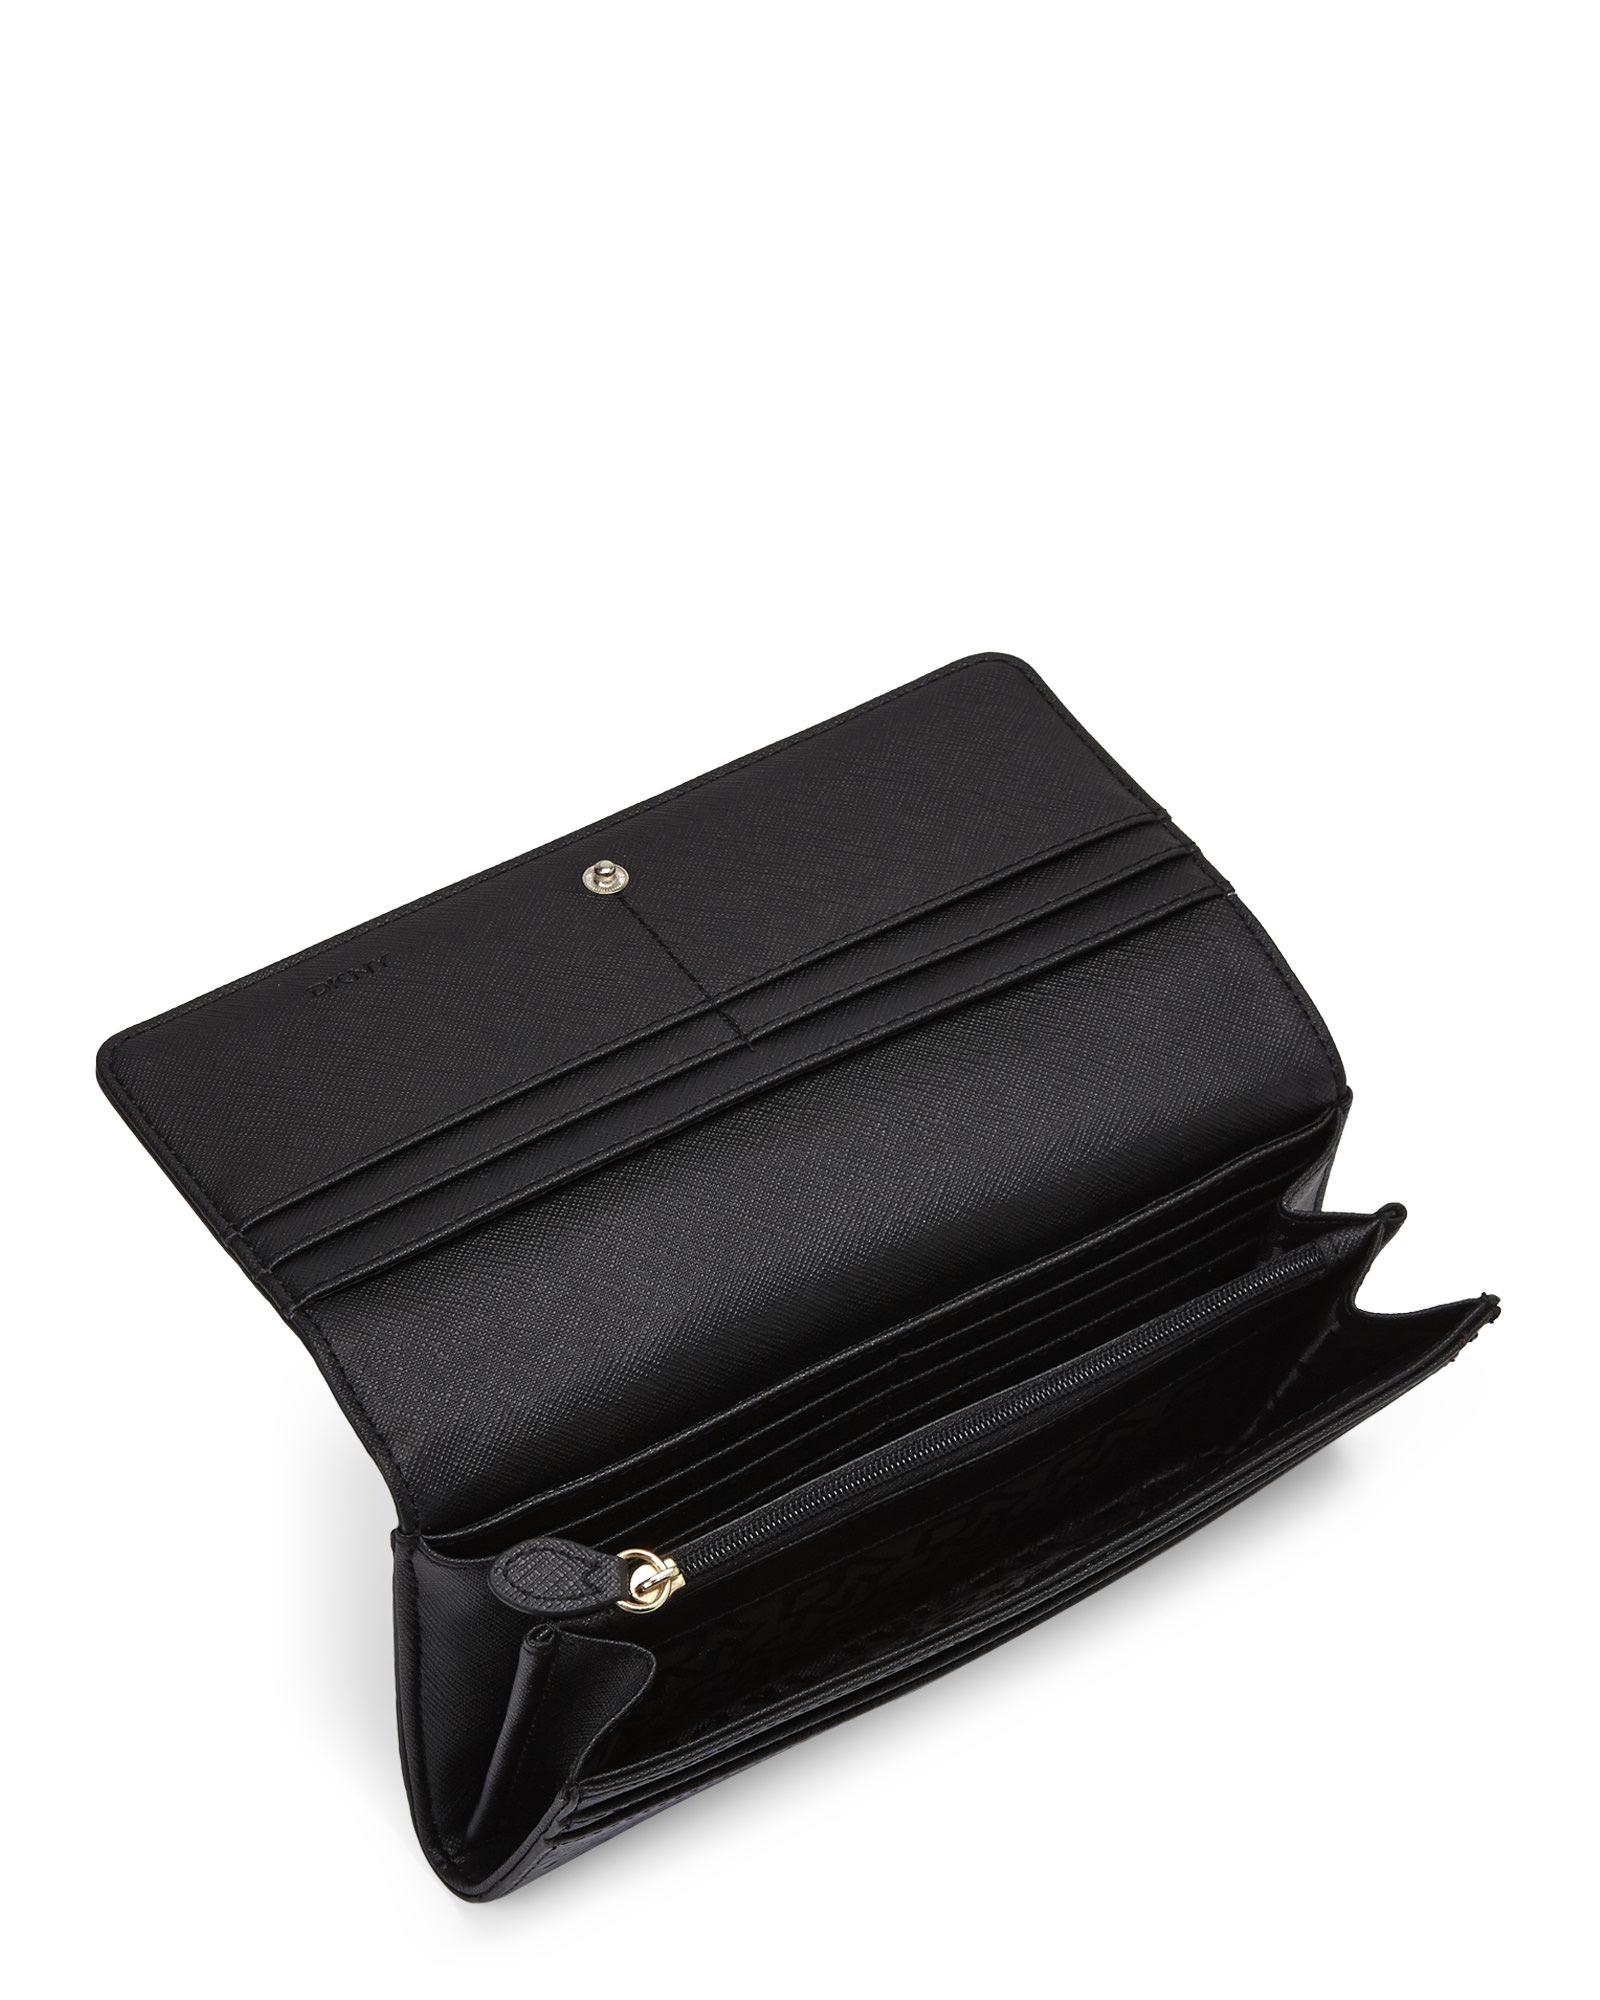 DKNY Black Leather Wallet In Gift Box for Men - Lyst |Dkny Wallet